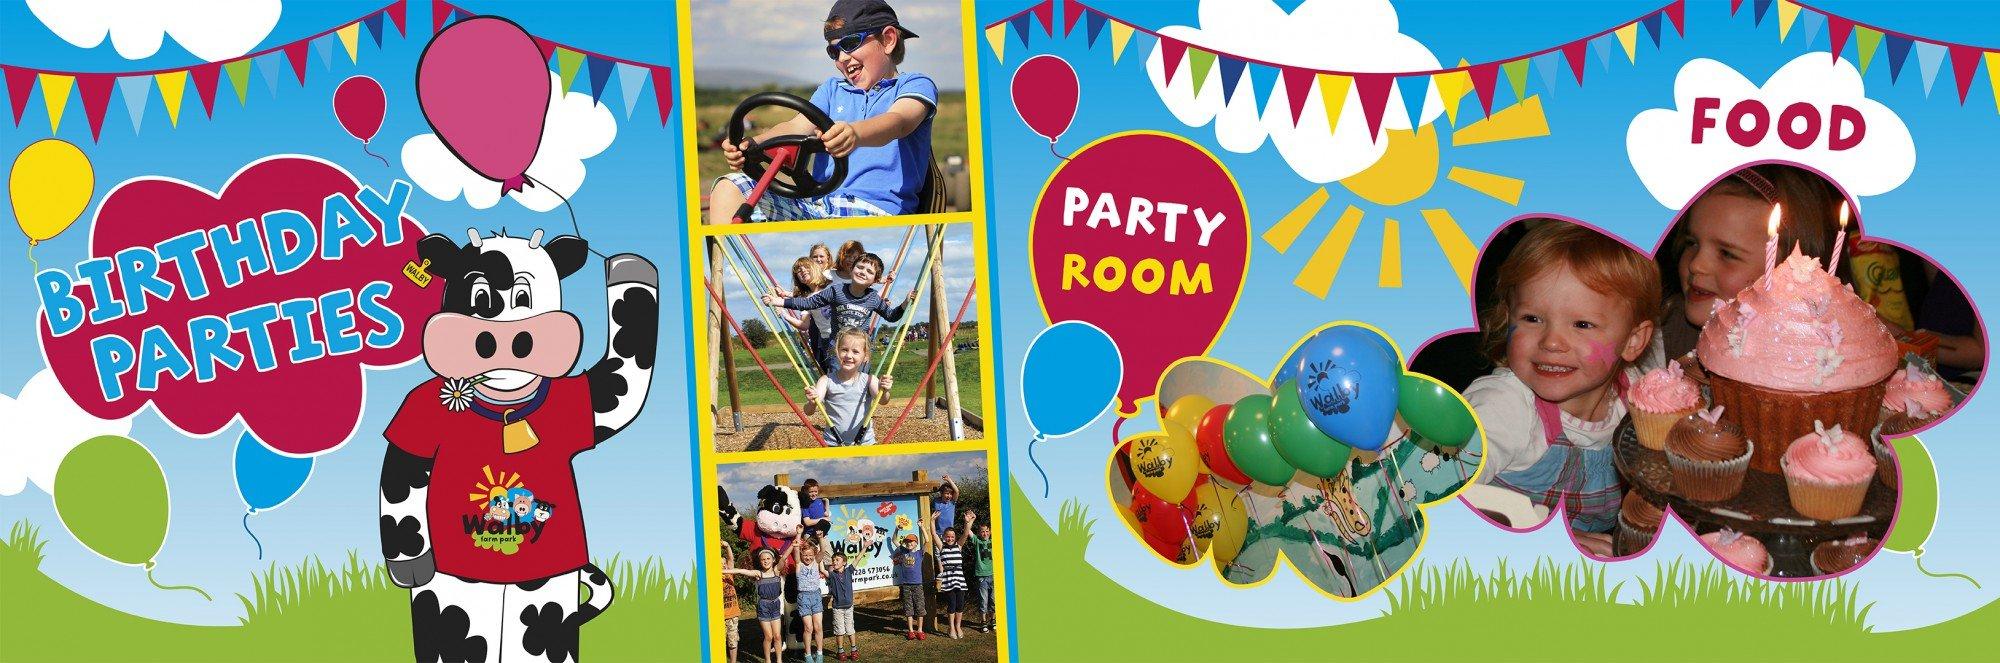 Birthday Parties Walby Farm Park